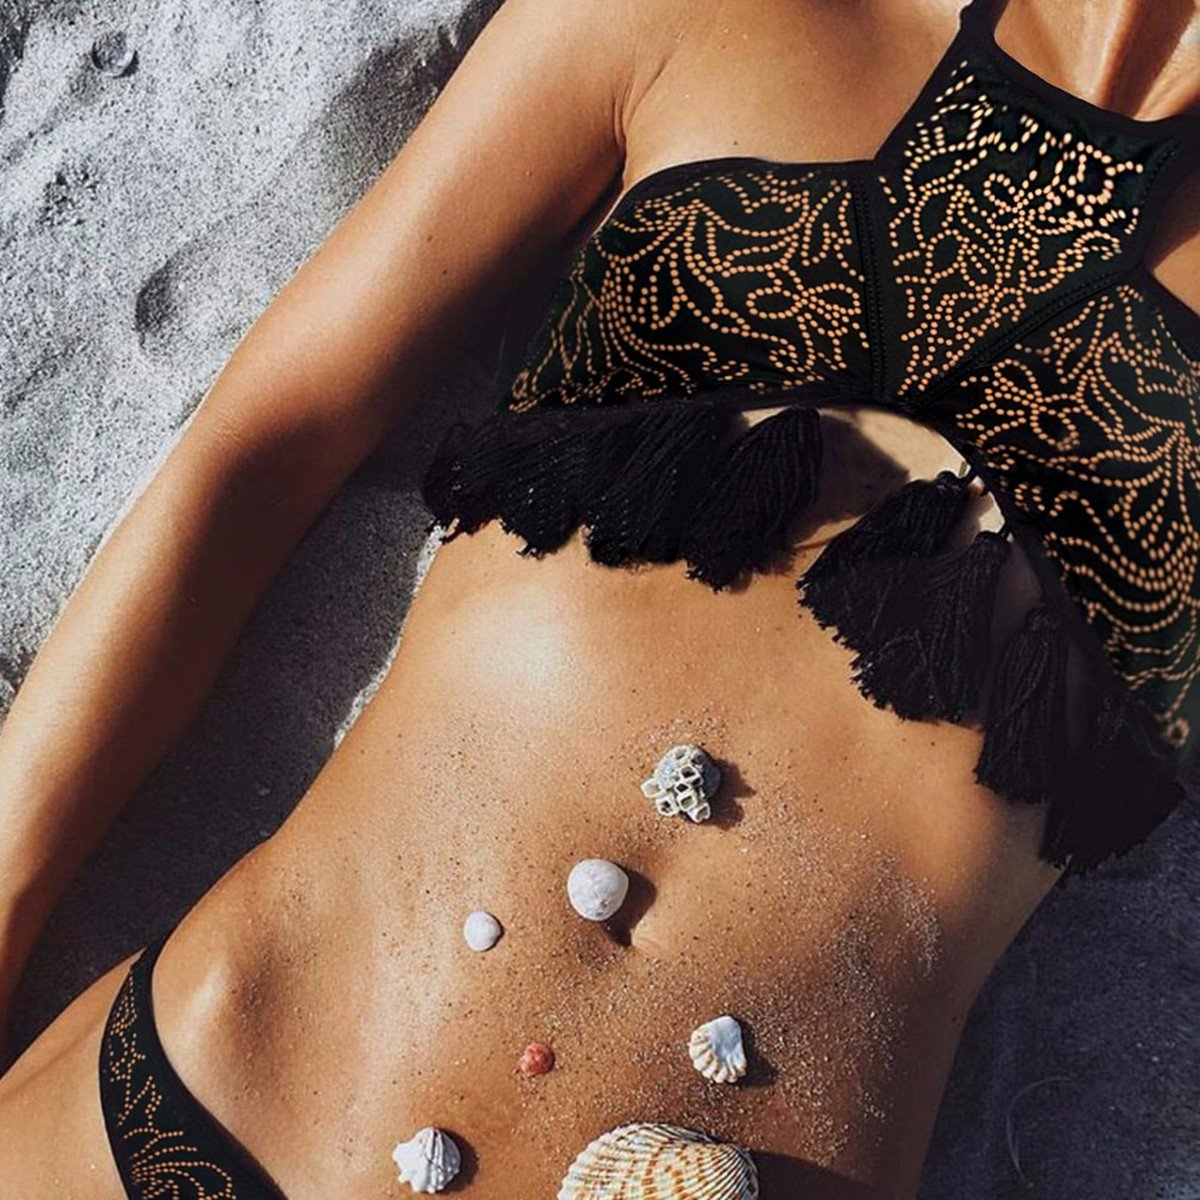 SKST Women Sexy Bikini Set Halter Print Tassel Push Up Padding Swimsuit Beachwear (S, Black)